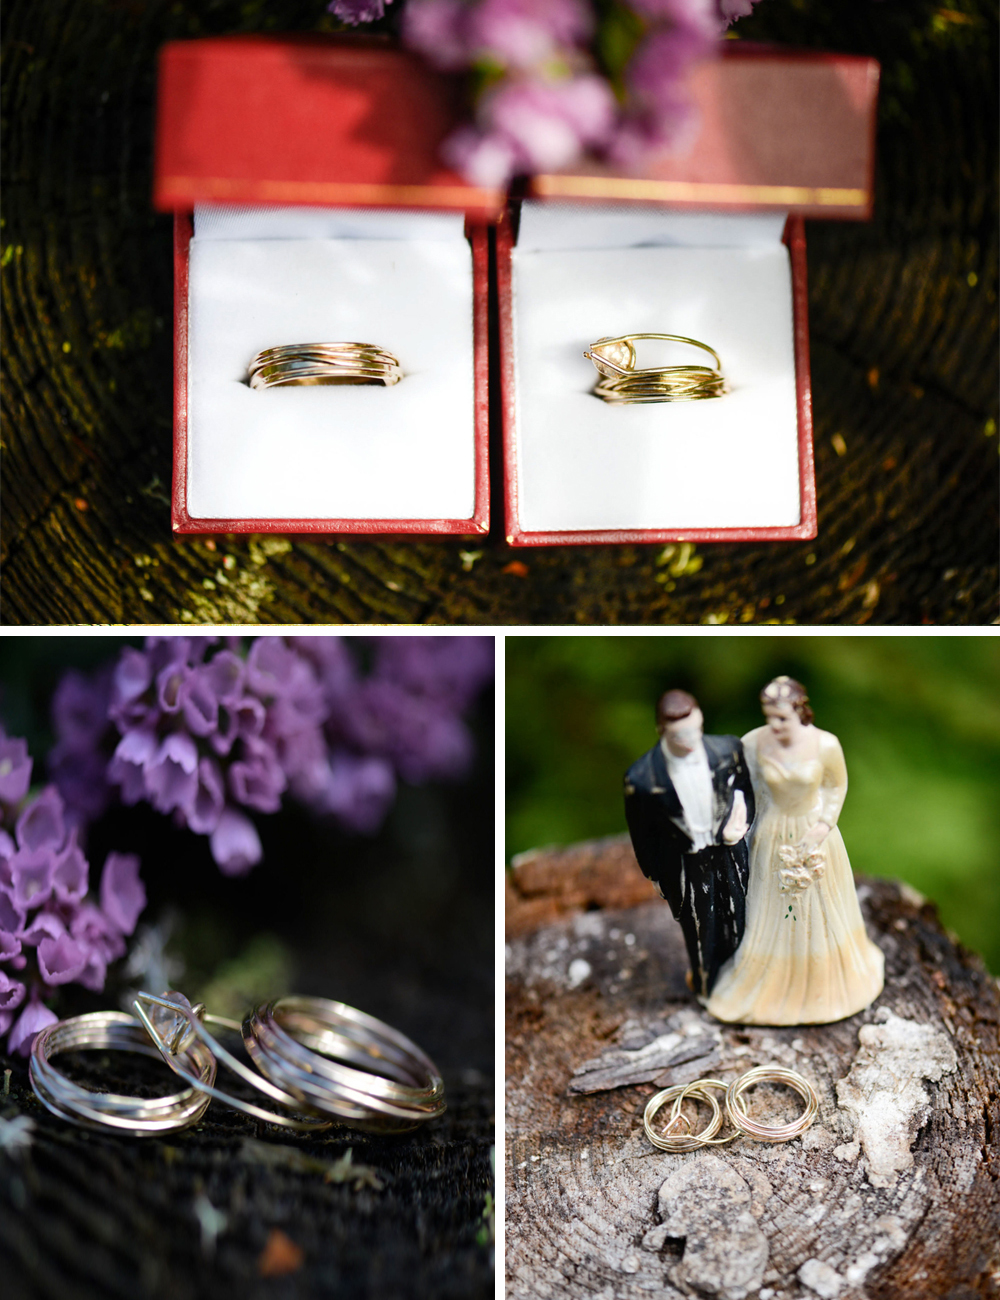 Handmade DIY wedding rings